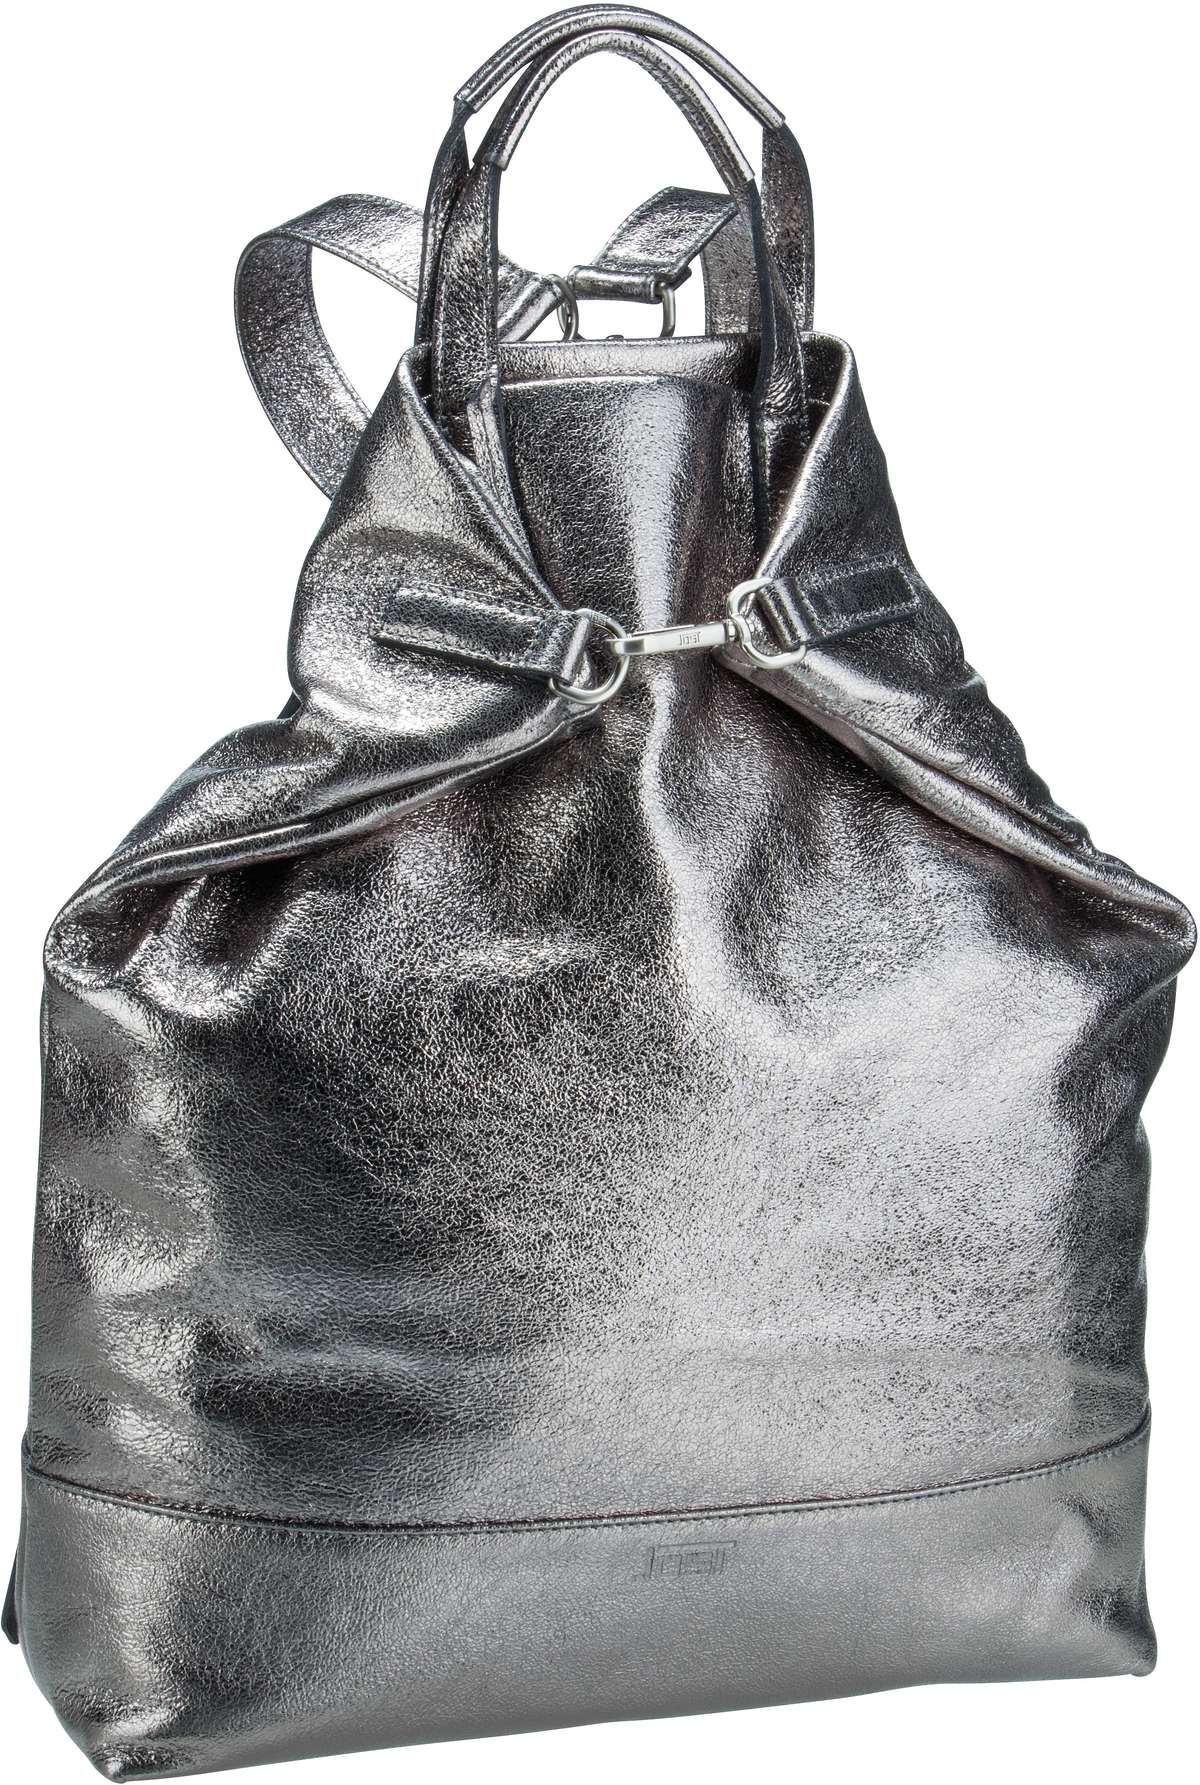 Rucksack / Daypack Boda 6632 X-Change Bag M Silver